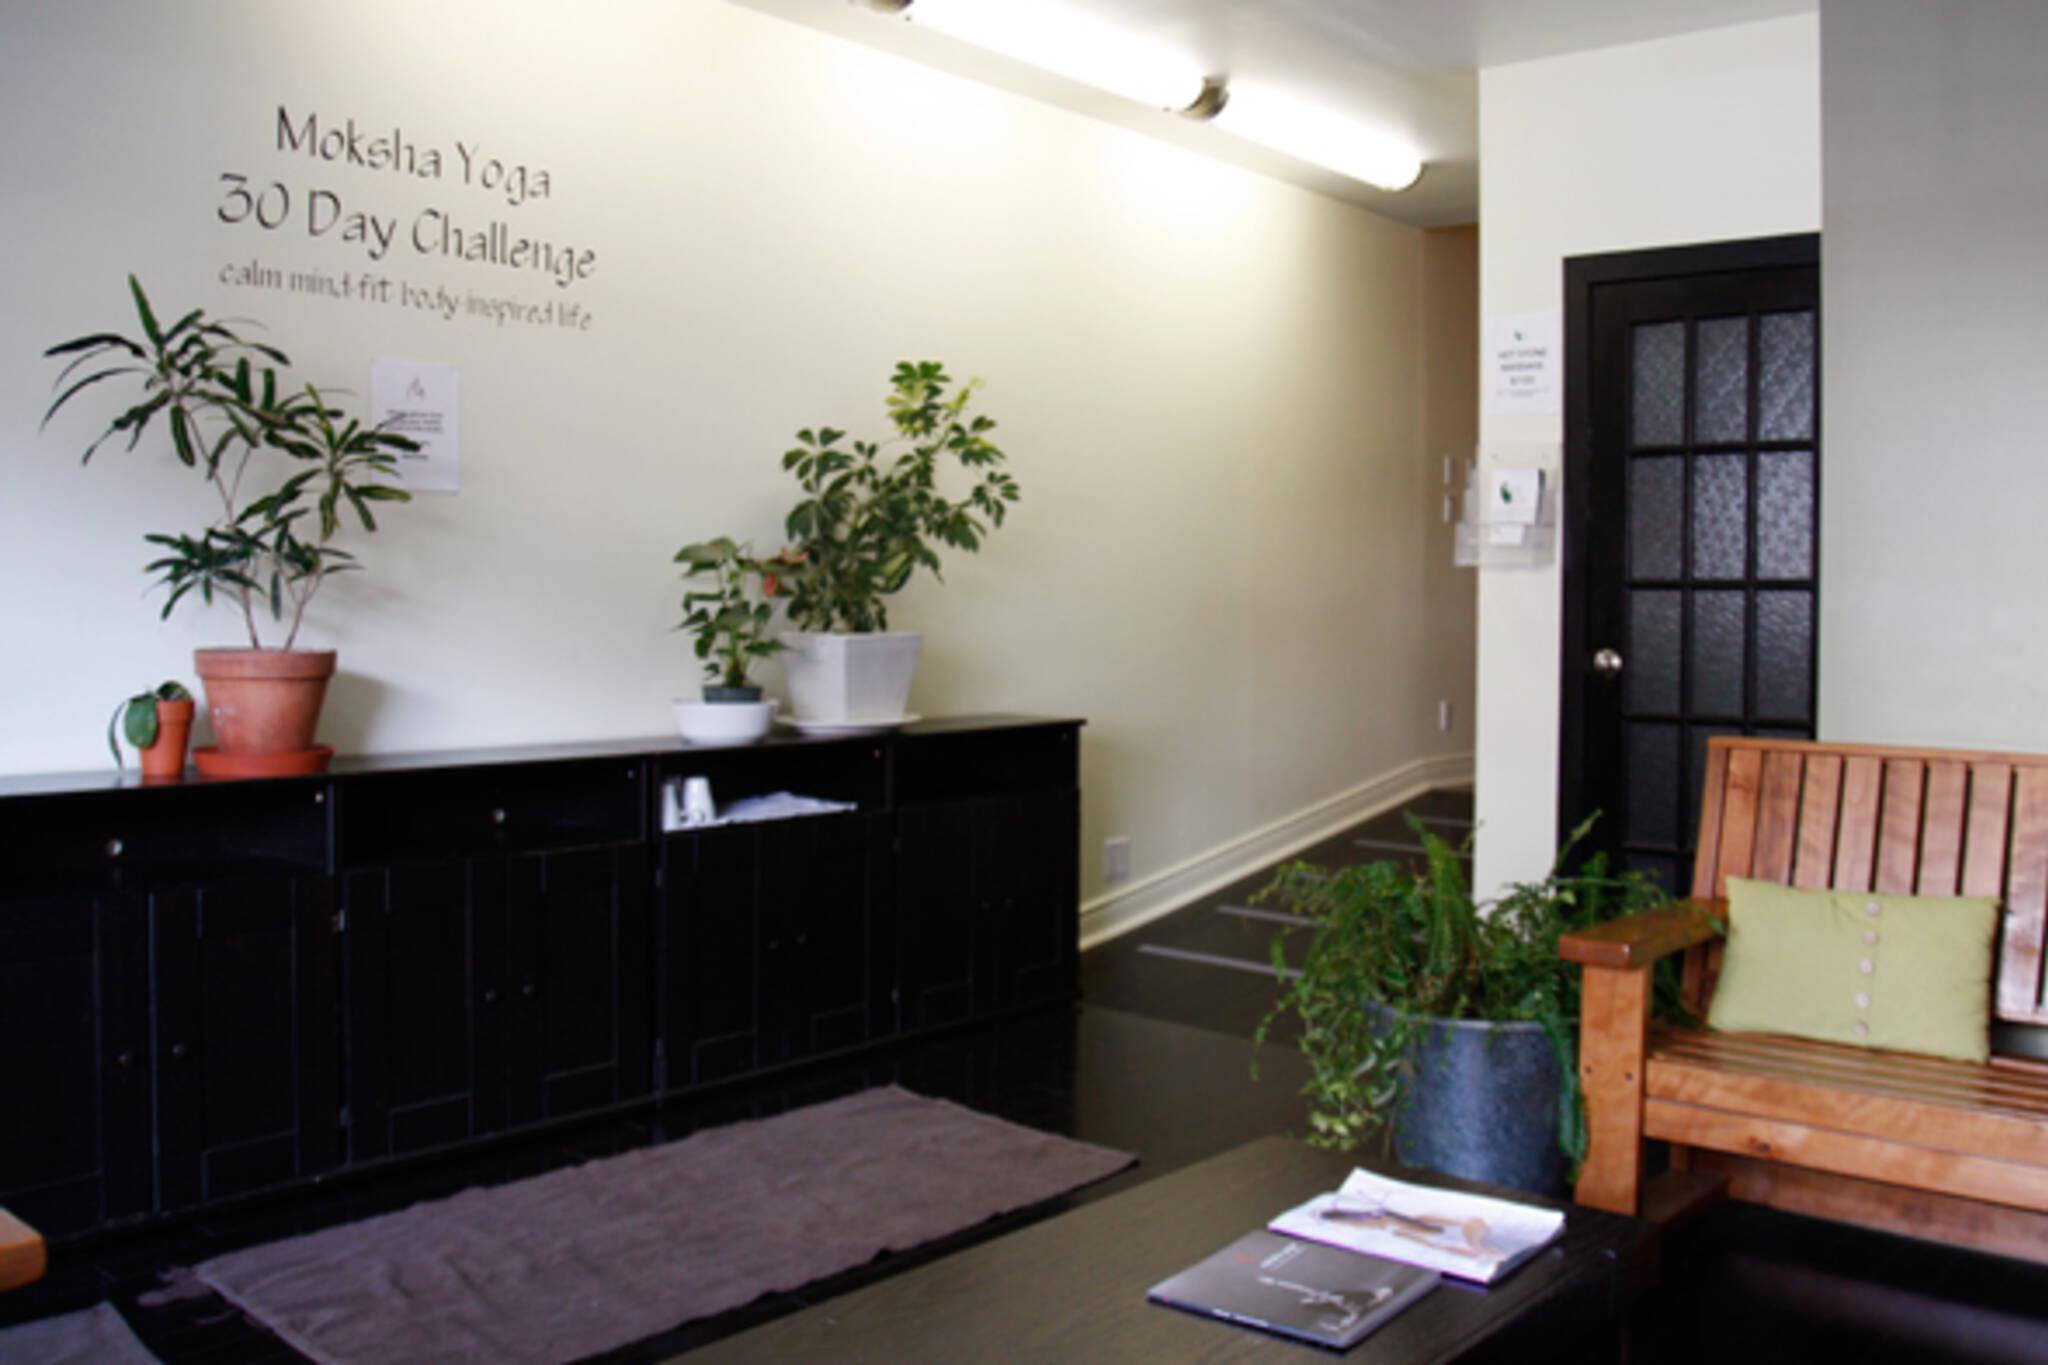 Moksha Yoga Toronto